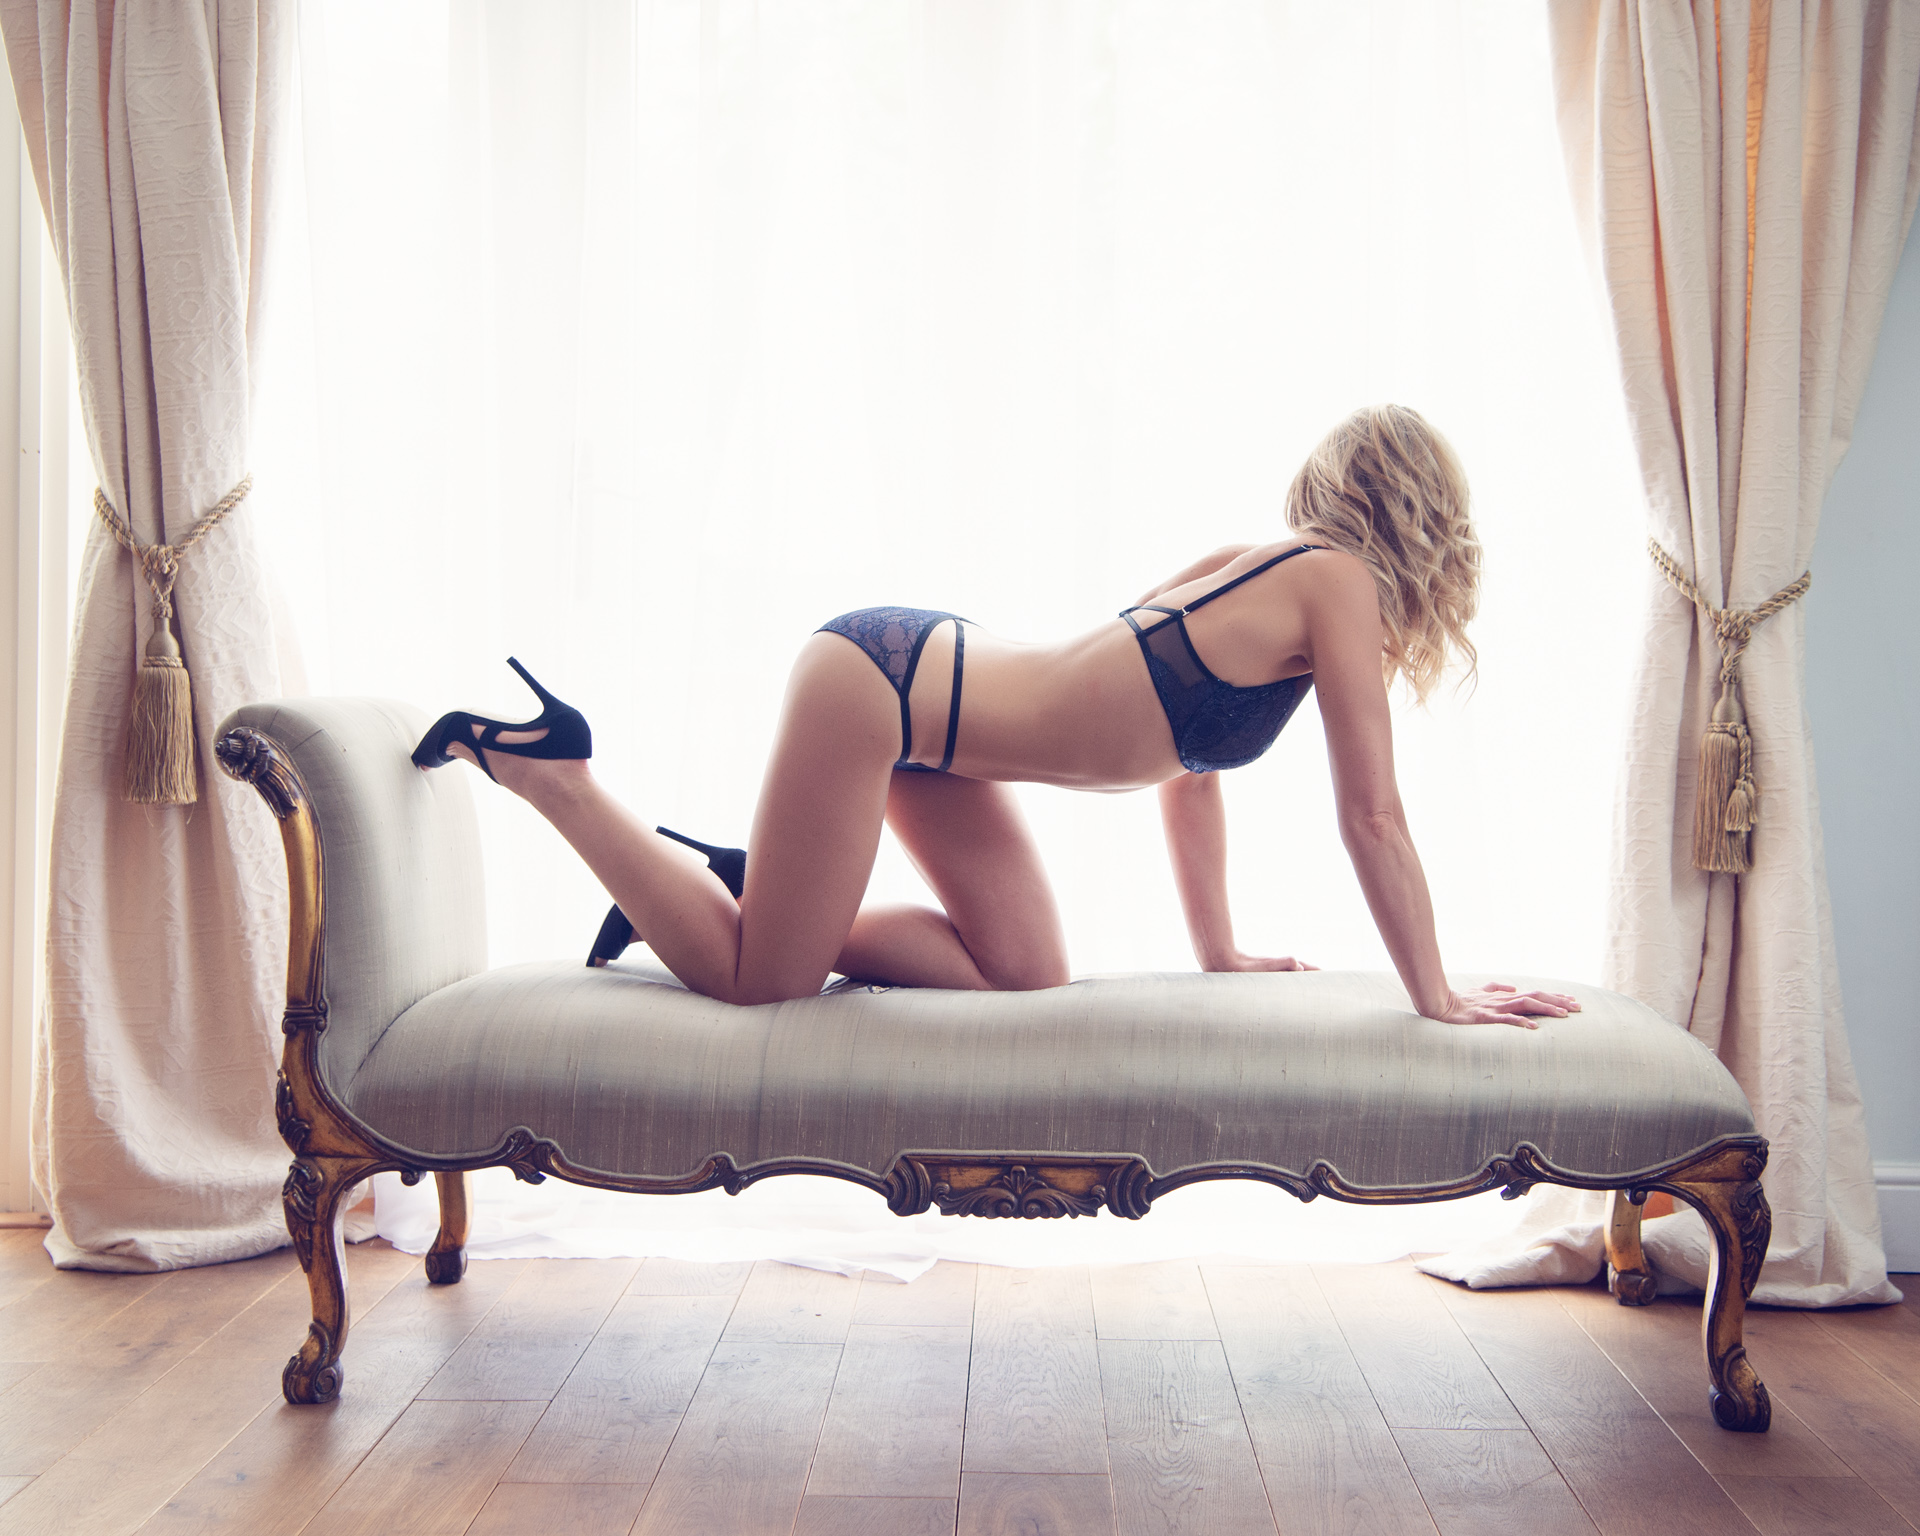 https://katehopewellsmith.com/wp-content/uploads/boudoir-photography-inspiration-kate-hopewell-smith-10.jpg